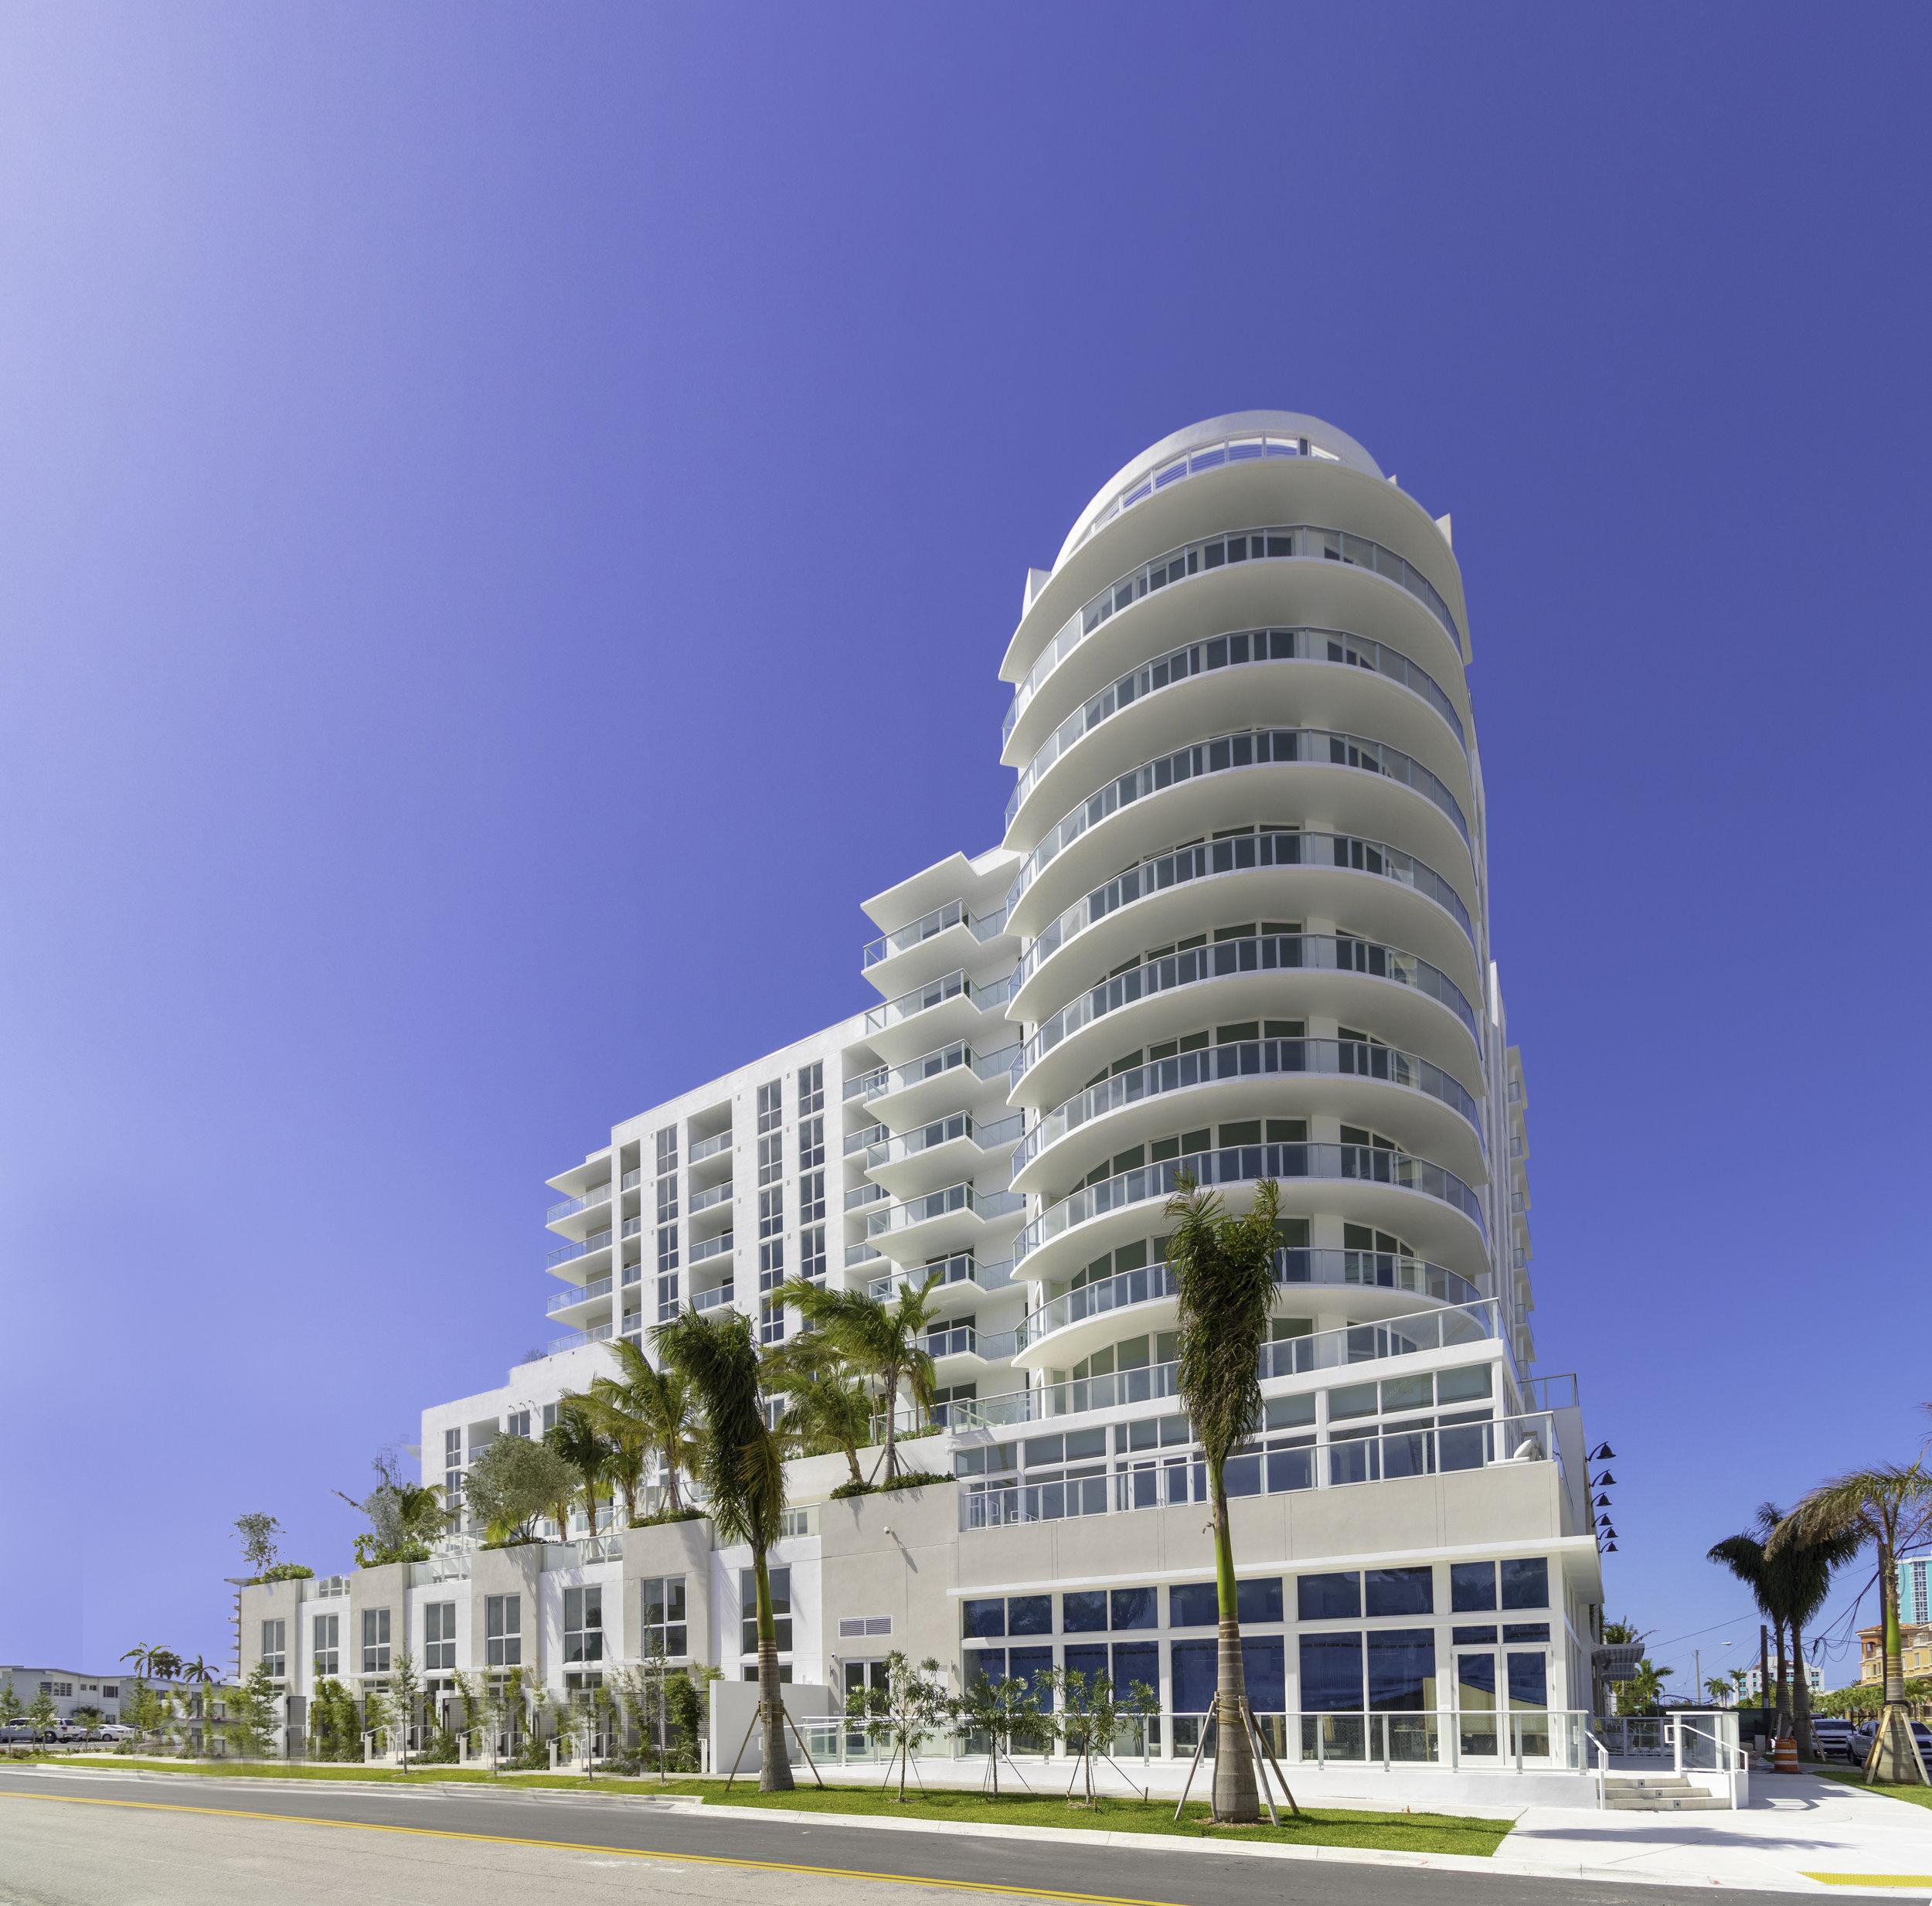 401 N Birch Rd, Fort Lauderdale, FL 33304